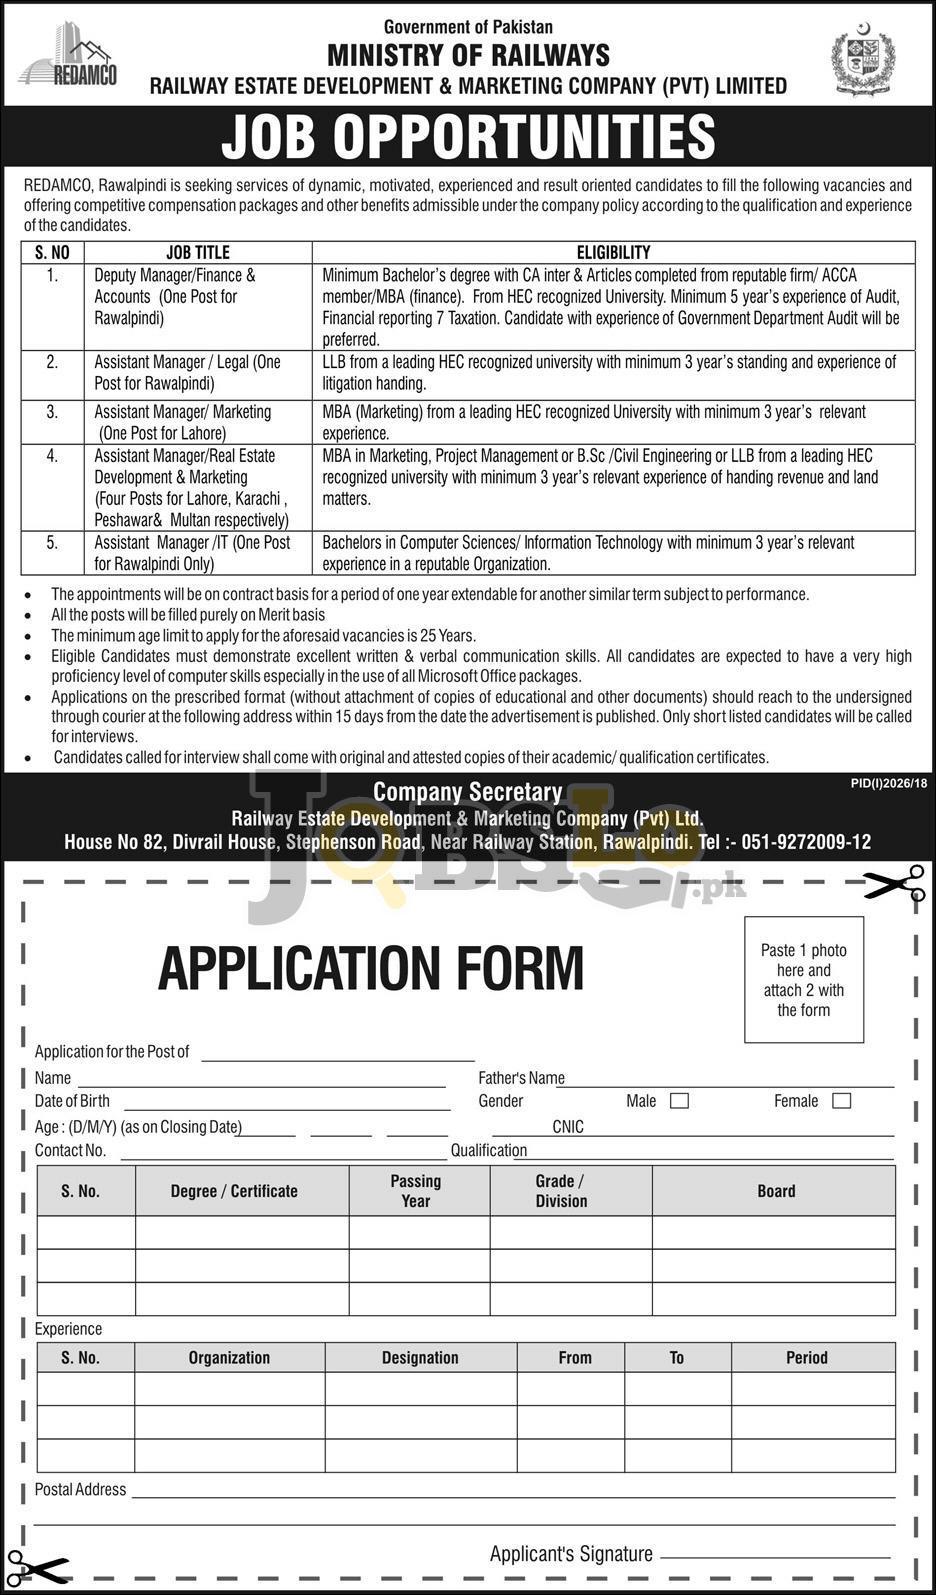 Ministry of Railway Jobs 2018 Govt of Pakistan Latest Career Vacancies Last date